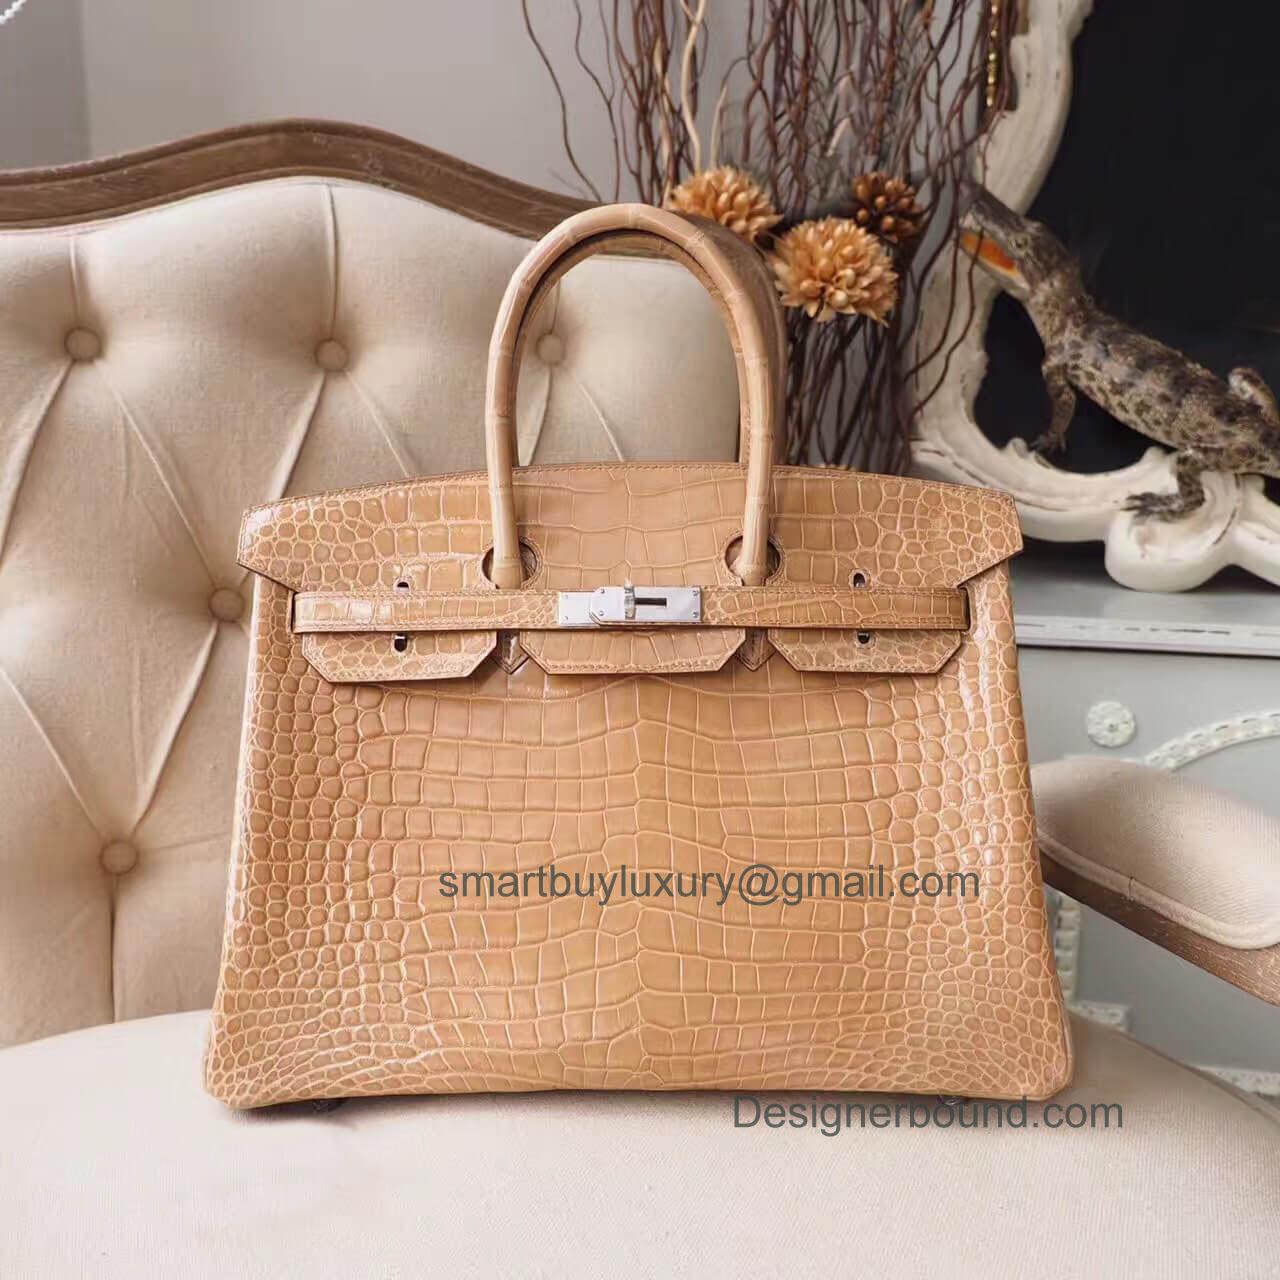 2abbcf1295 Hermes Birkin 35 Bag in ck14 Beige Shiny Porosus Croc PHW